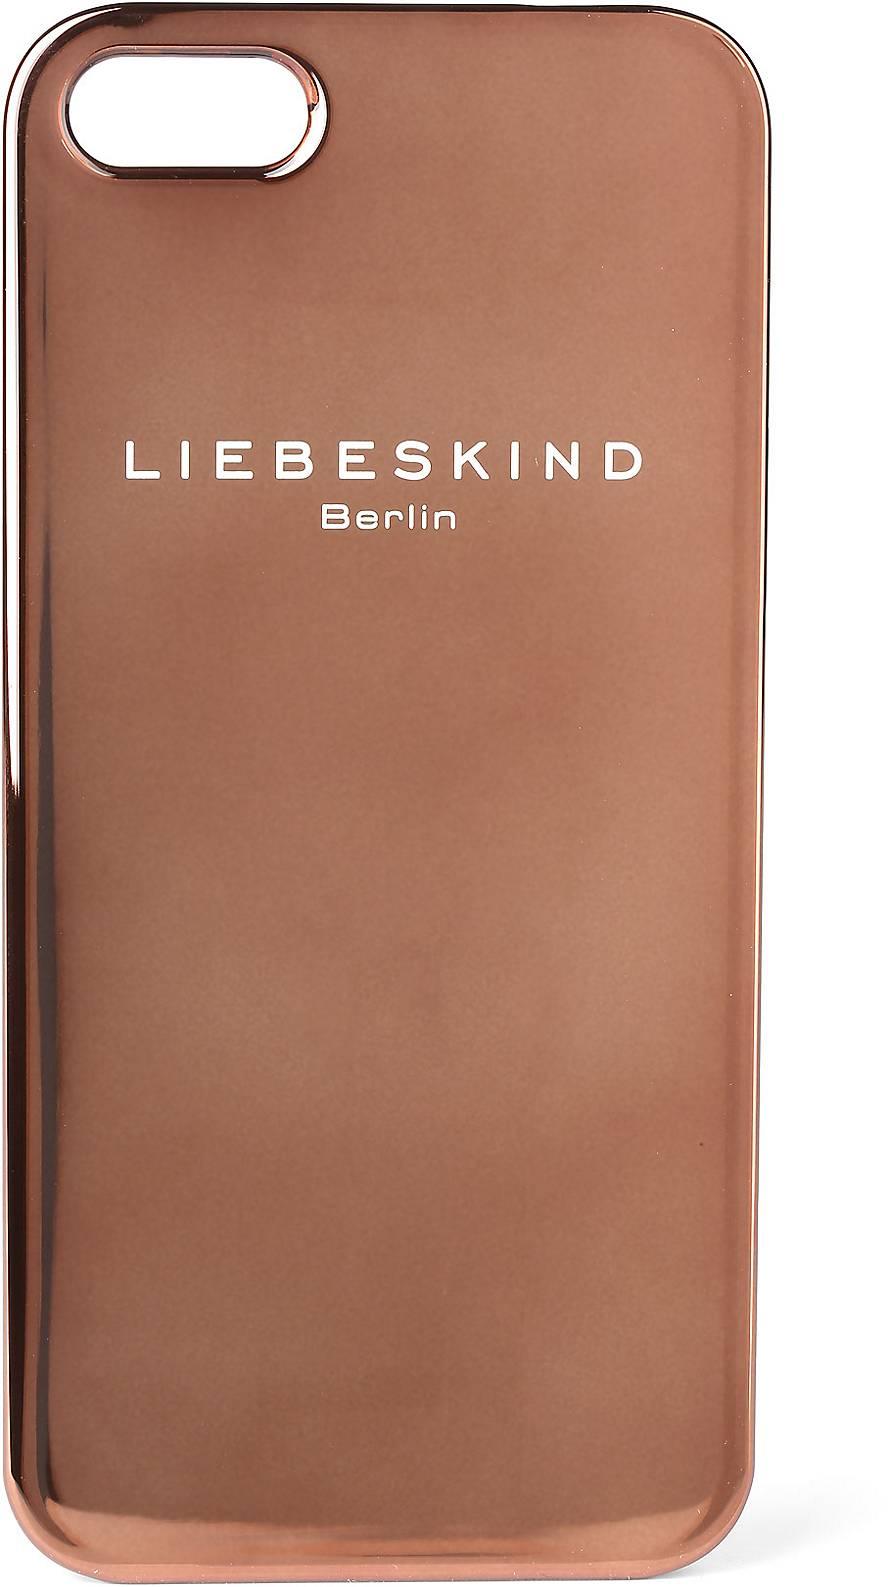 fotos liebeskind berlin mobilecap 5 iphone case. Black Bedroom Furniture Sets. Home Design Ideas